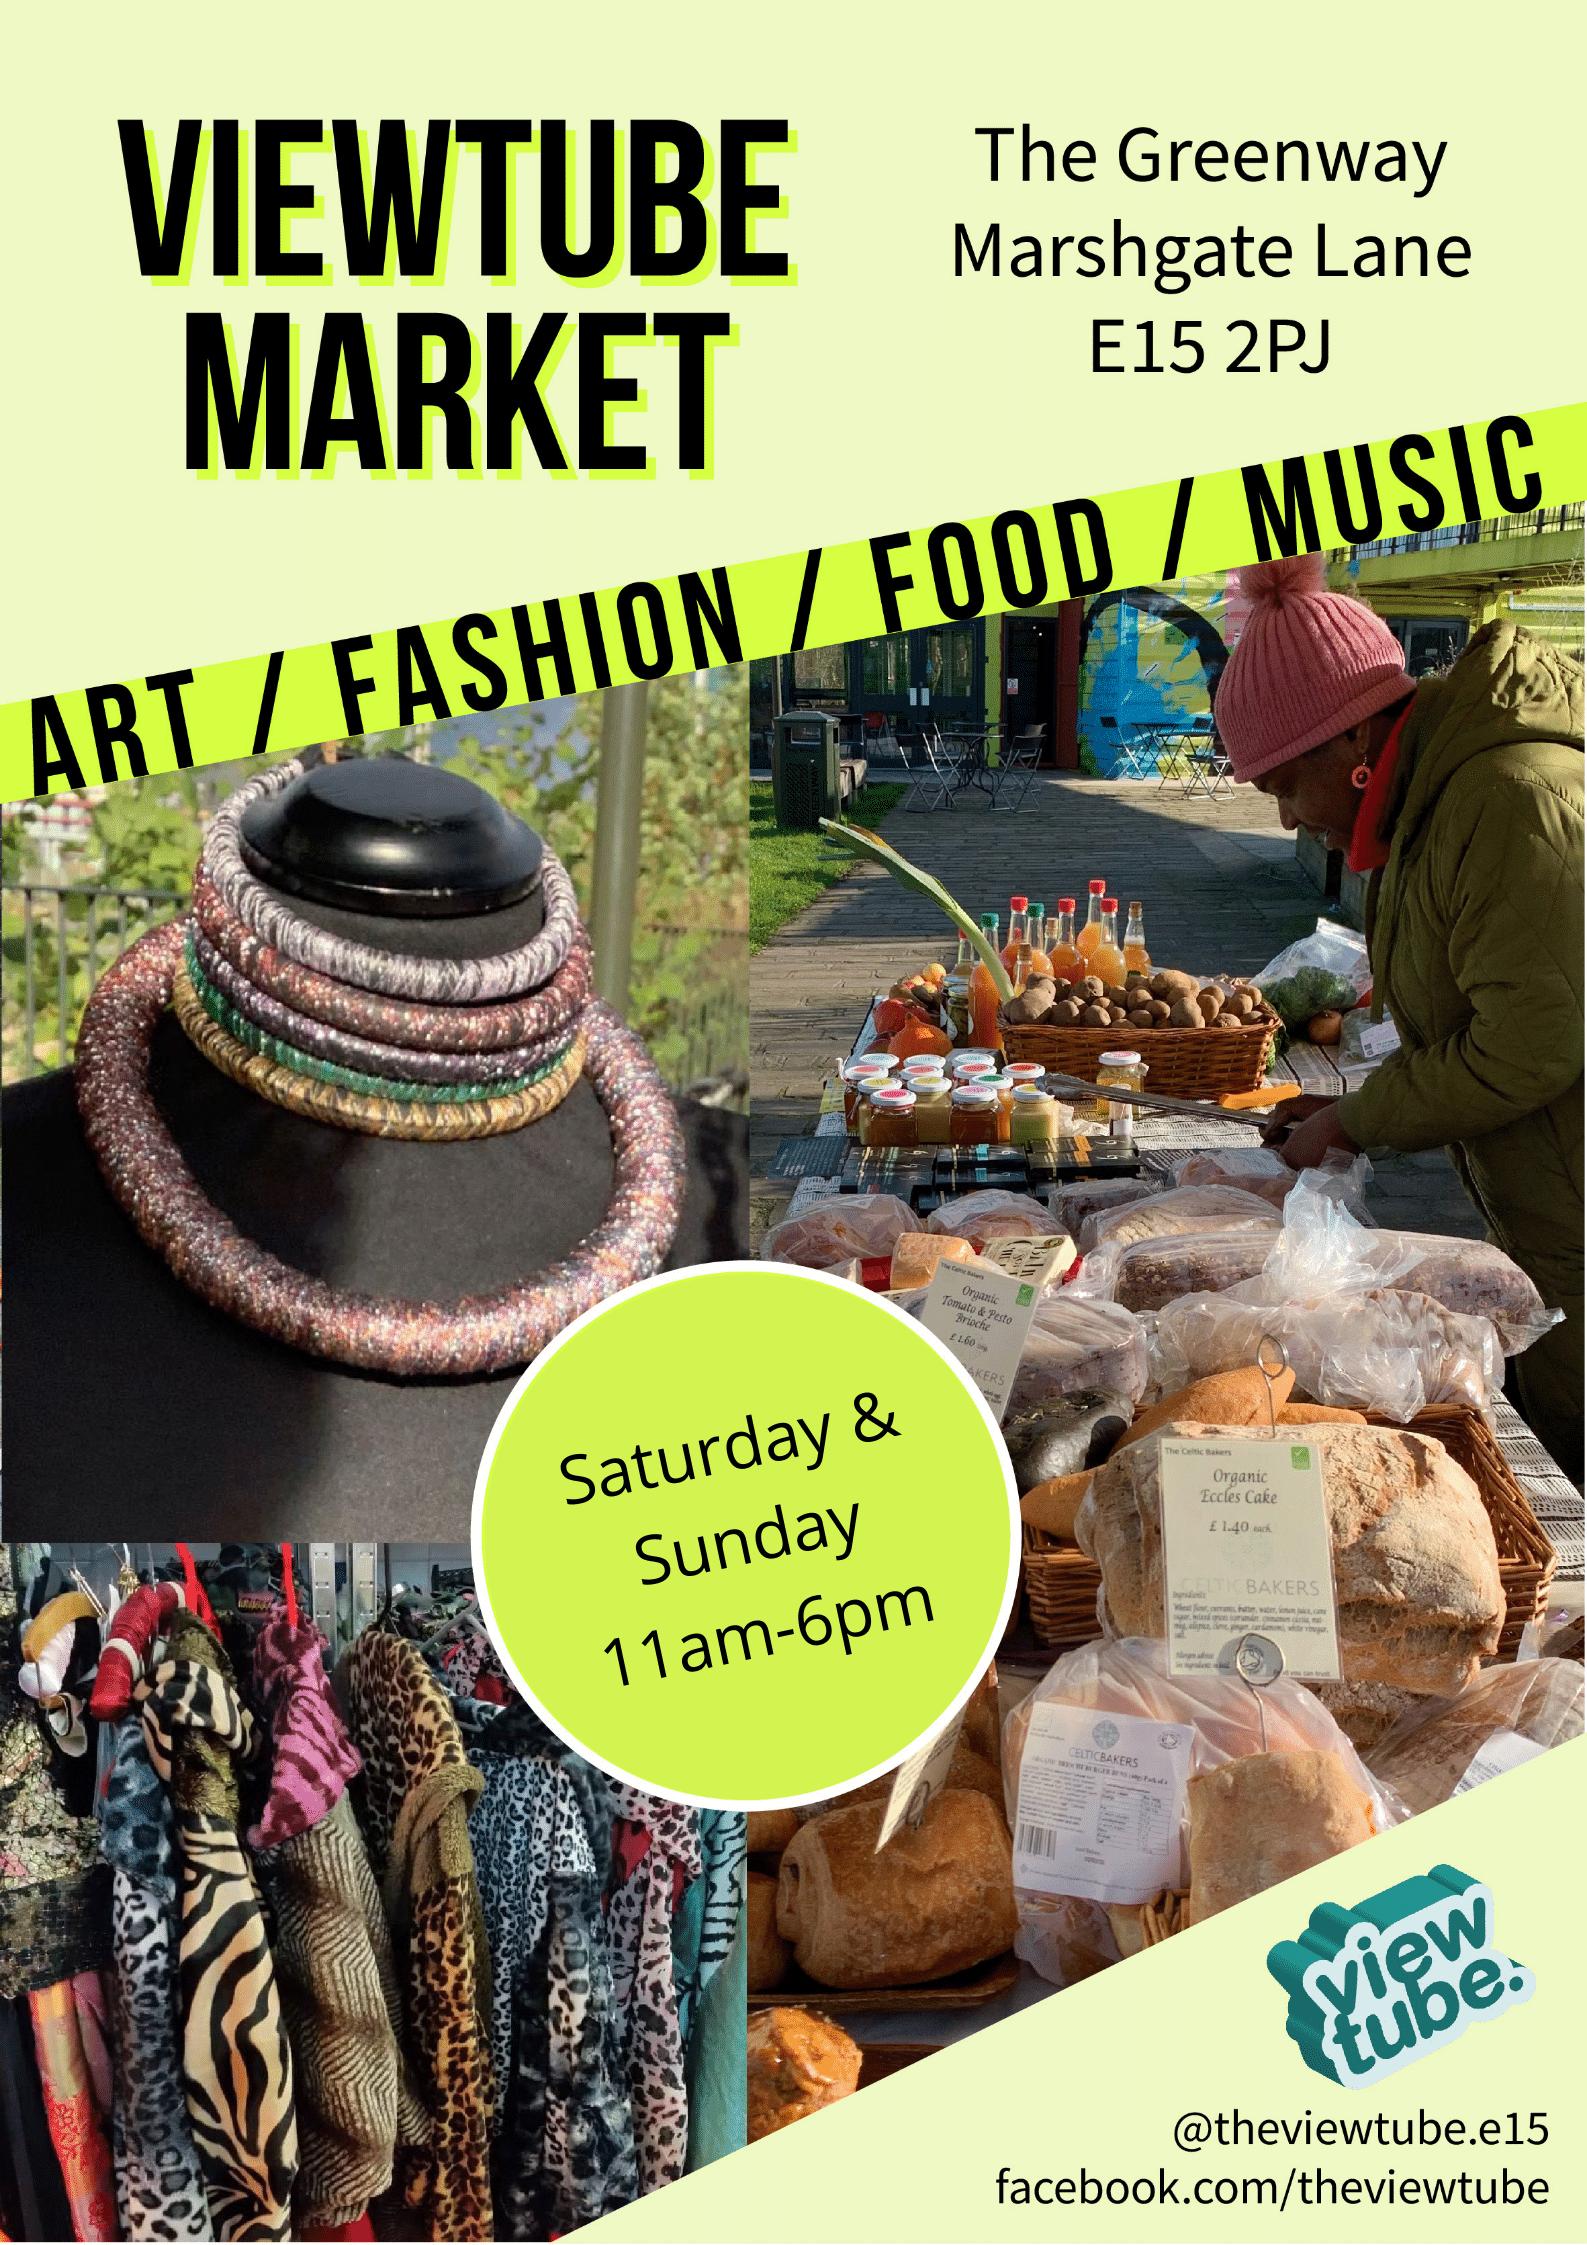 viewtube market flyer